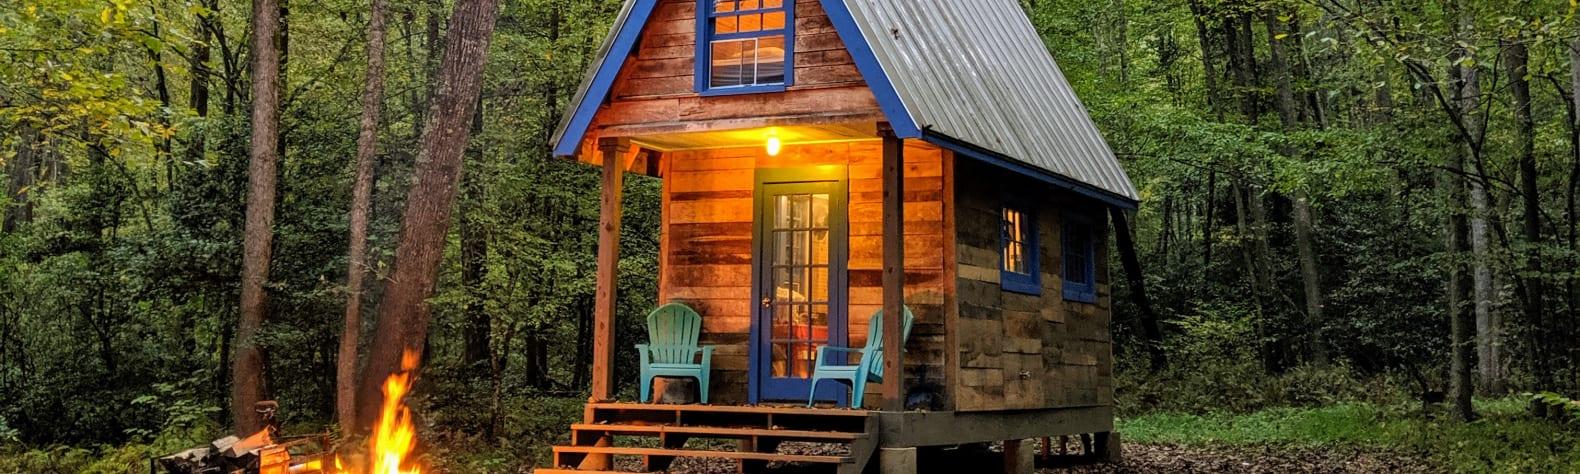 Tiny House in Happy Valley